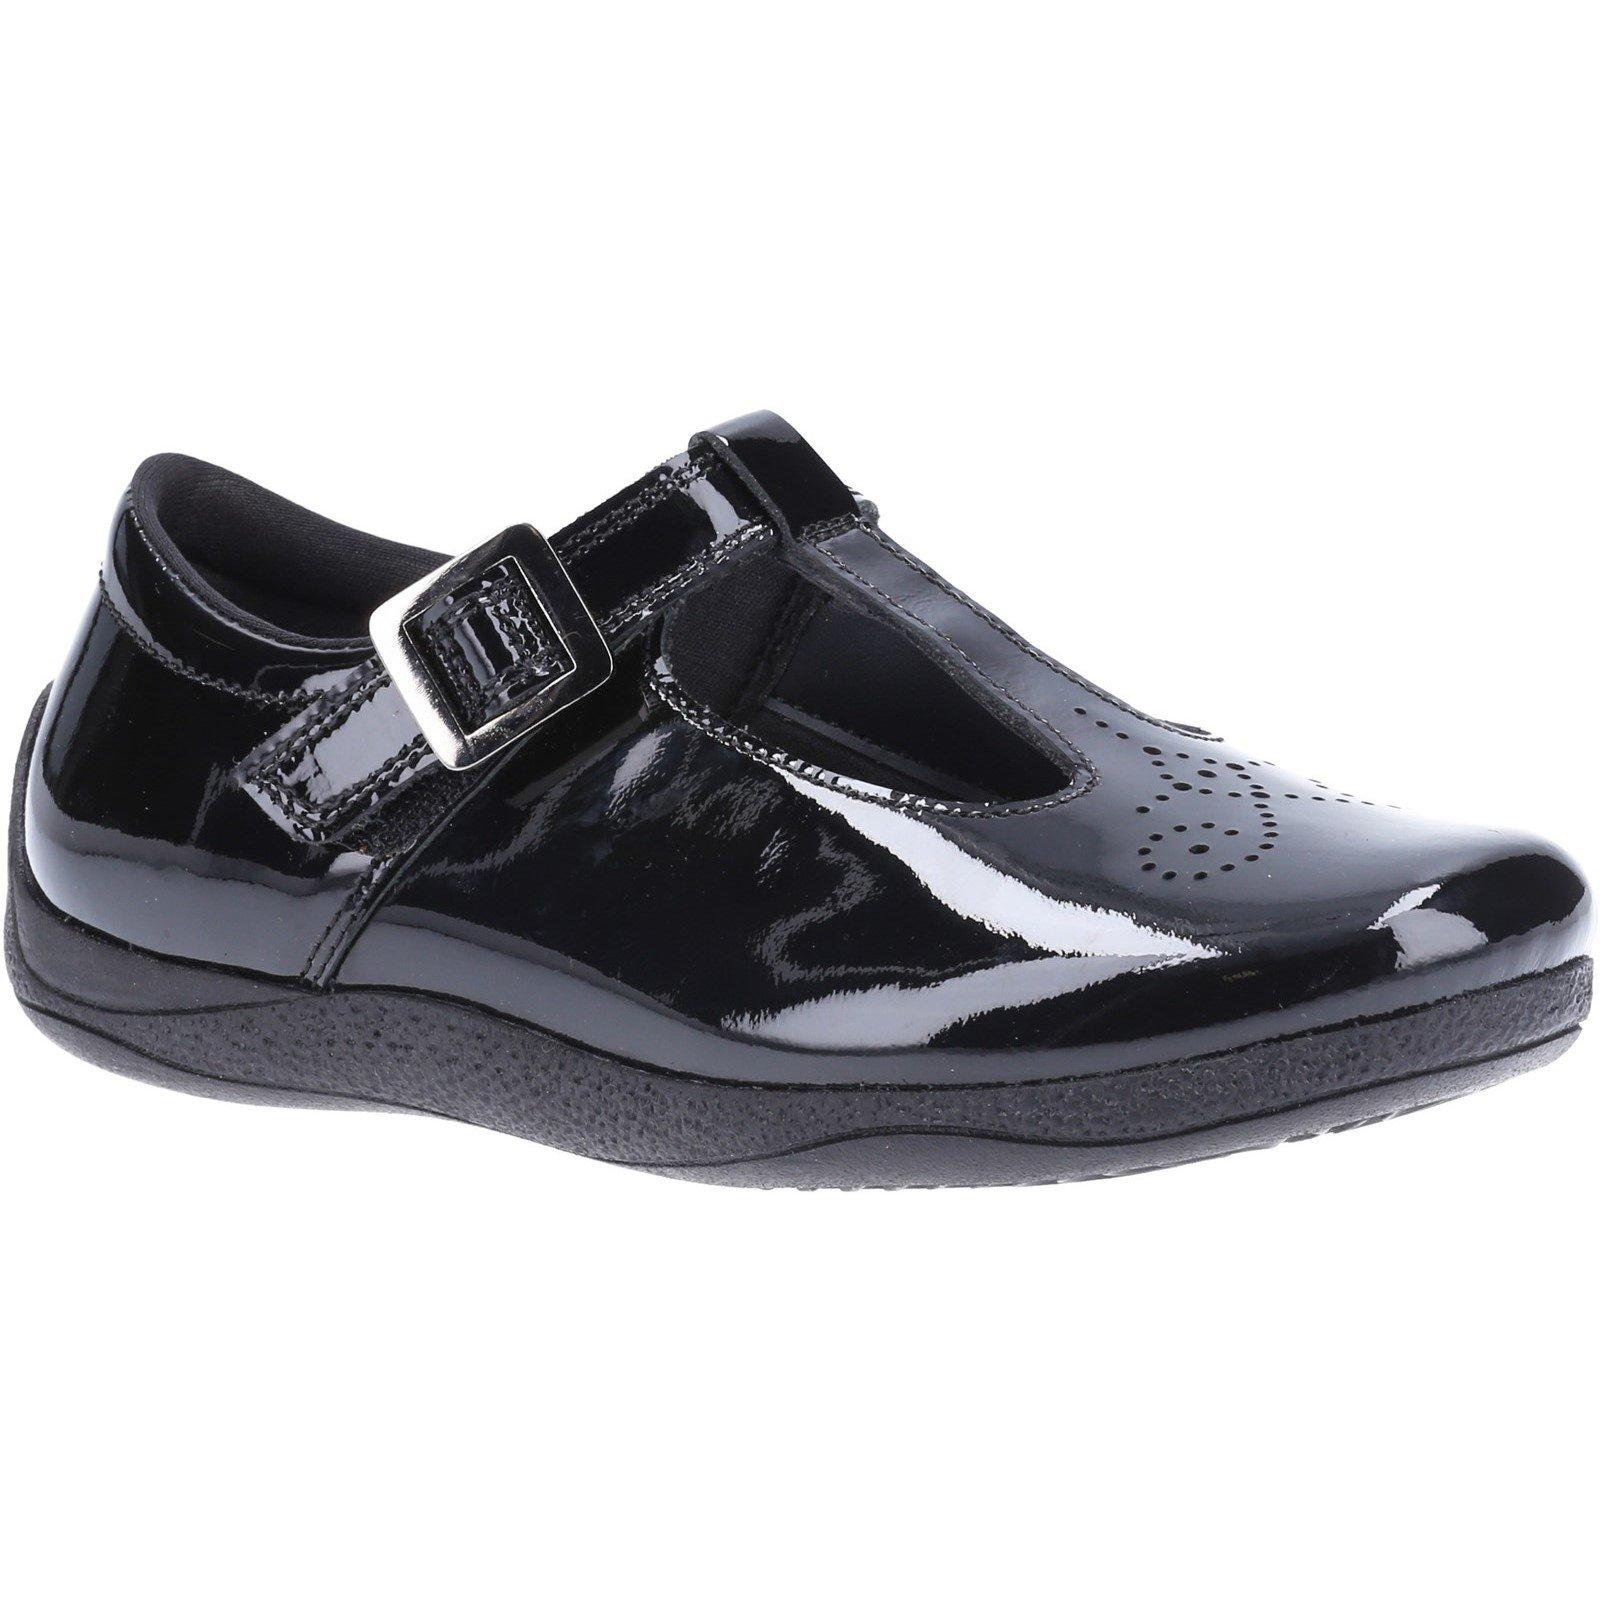 Hush Puppies Kid's Eliza Senior School Shoe Patent Black 32592 - Patent Black 3